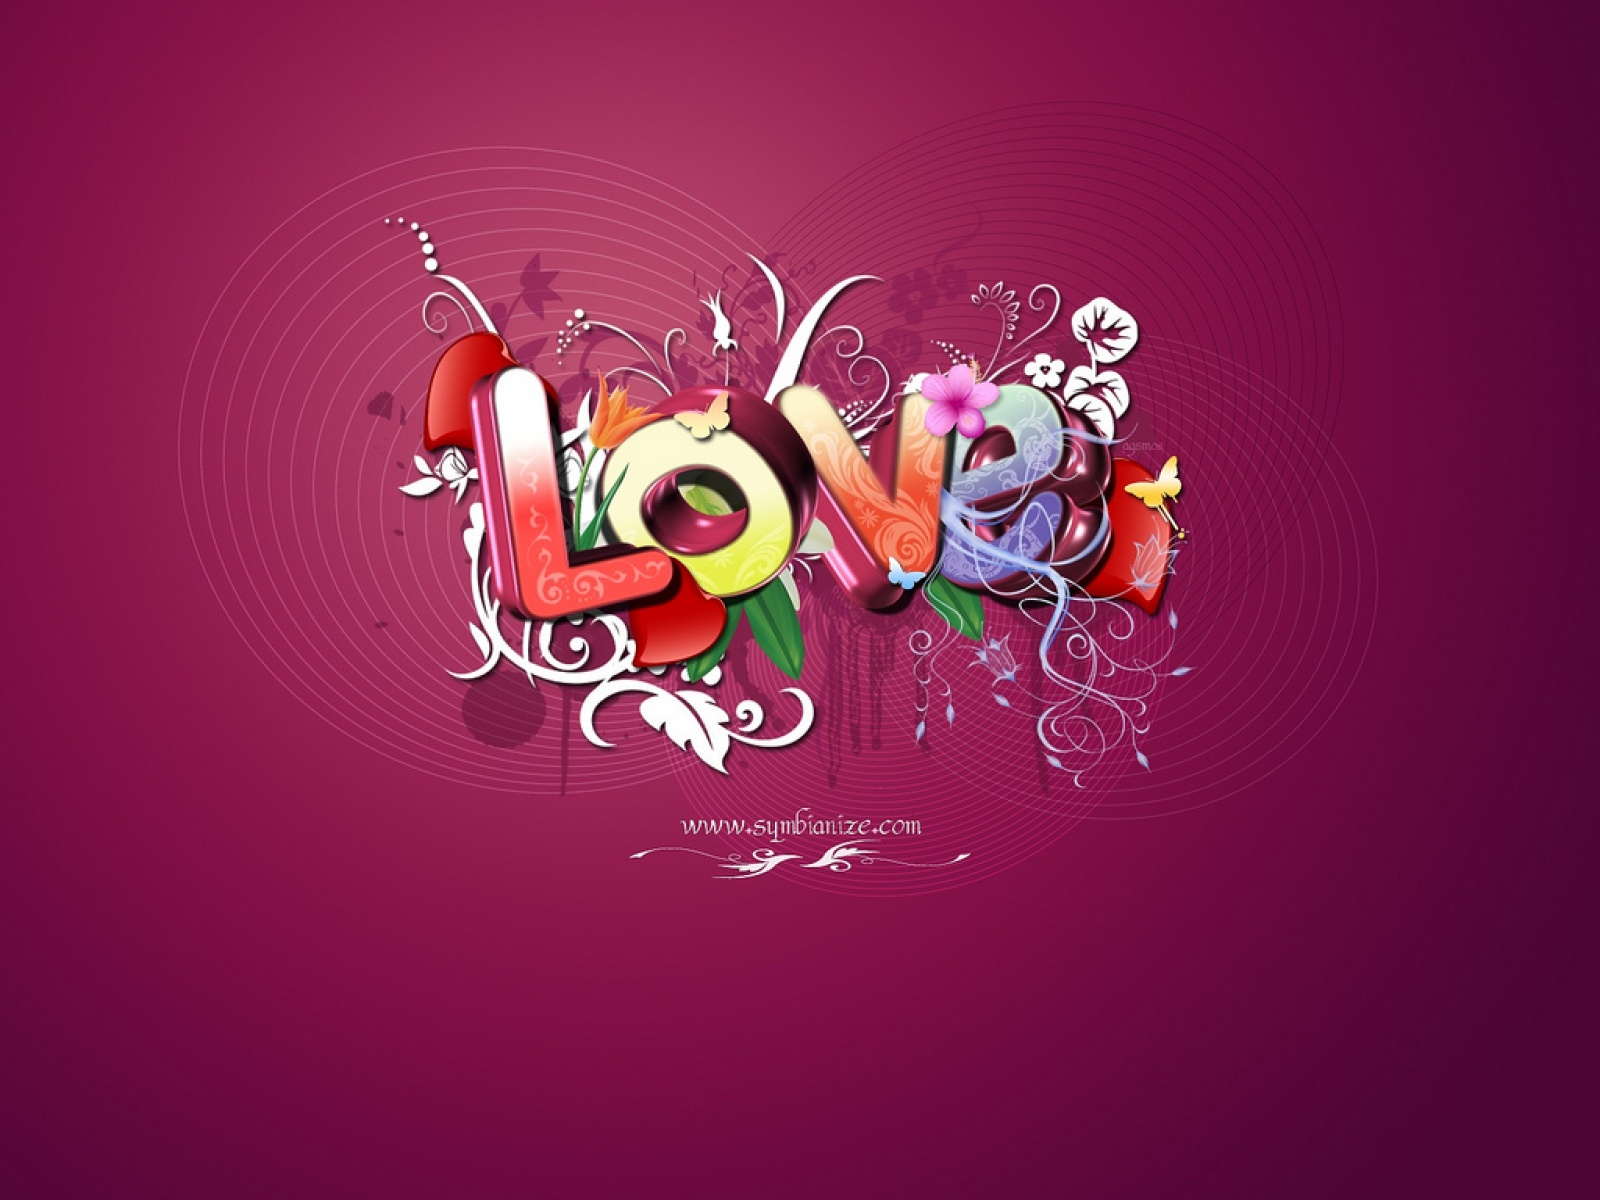 desktop backgrounds wallpapers valentines day hd desktop backgrounds 1600x1200